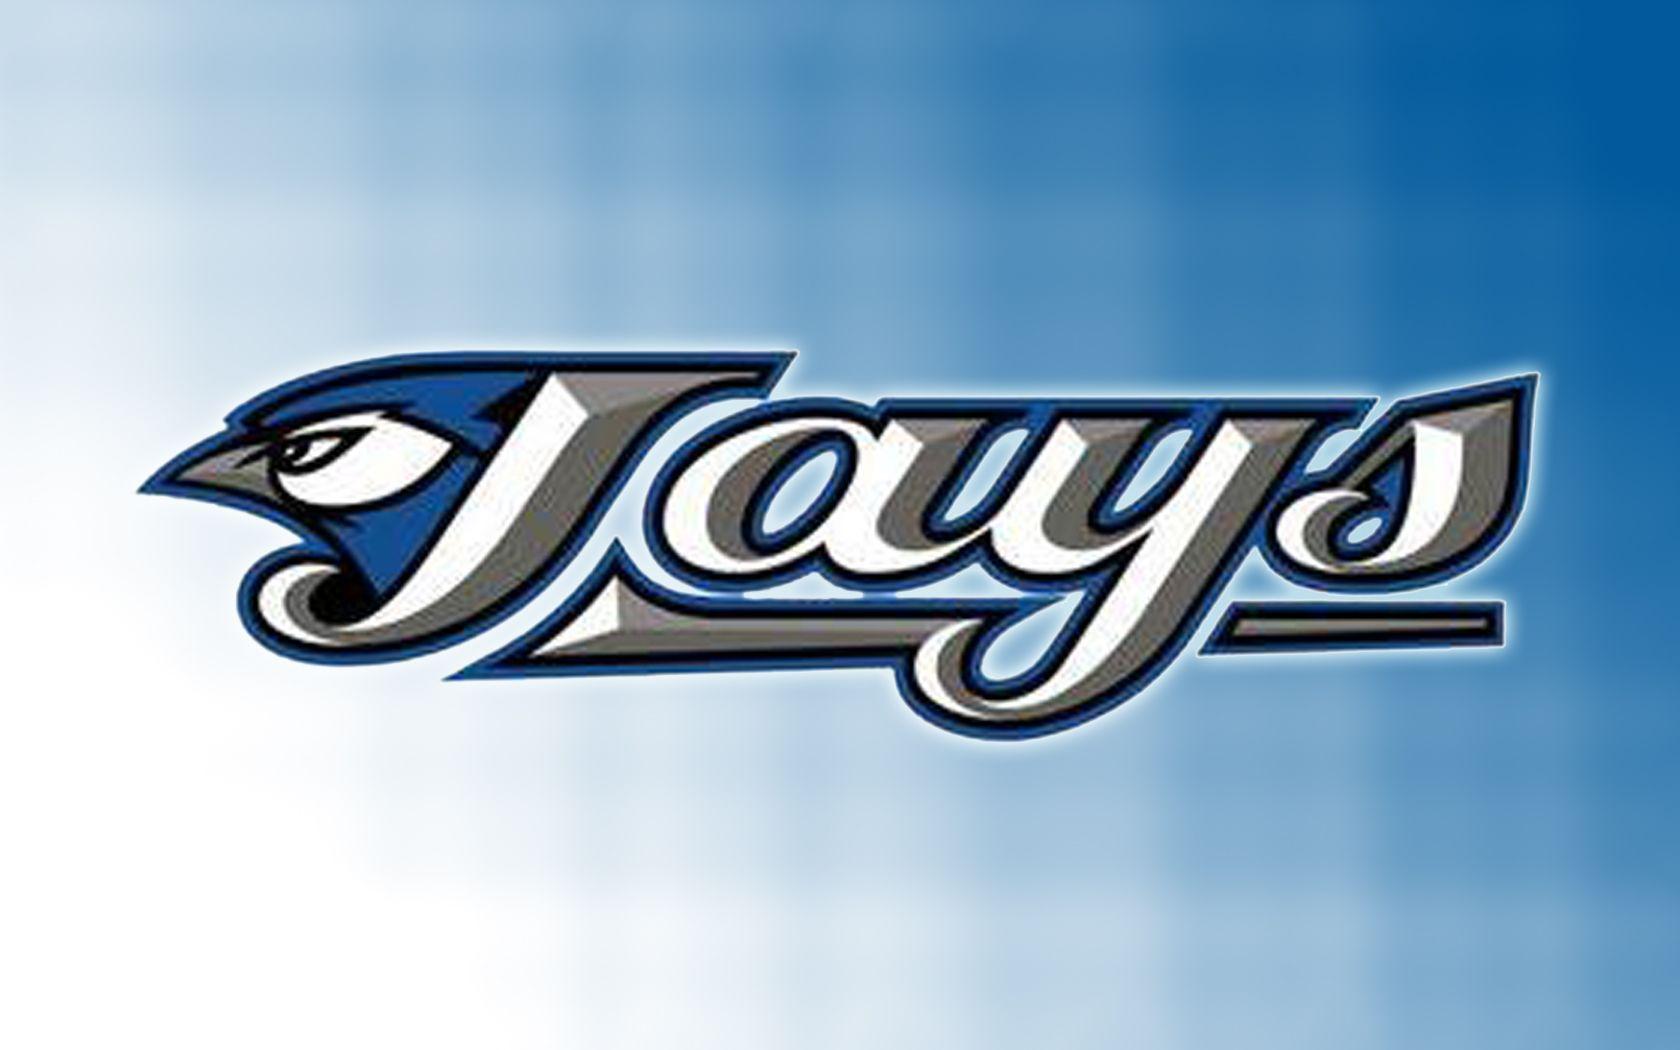 Toronto Blue Jays Logo wallpaper 1680x1050